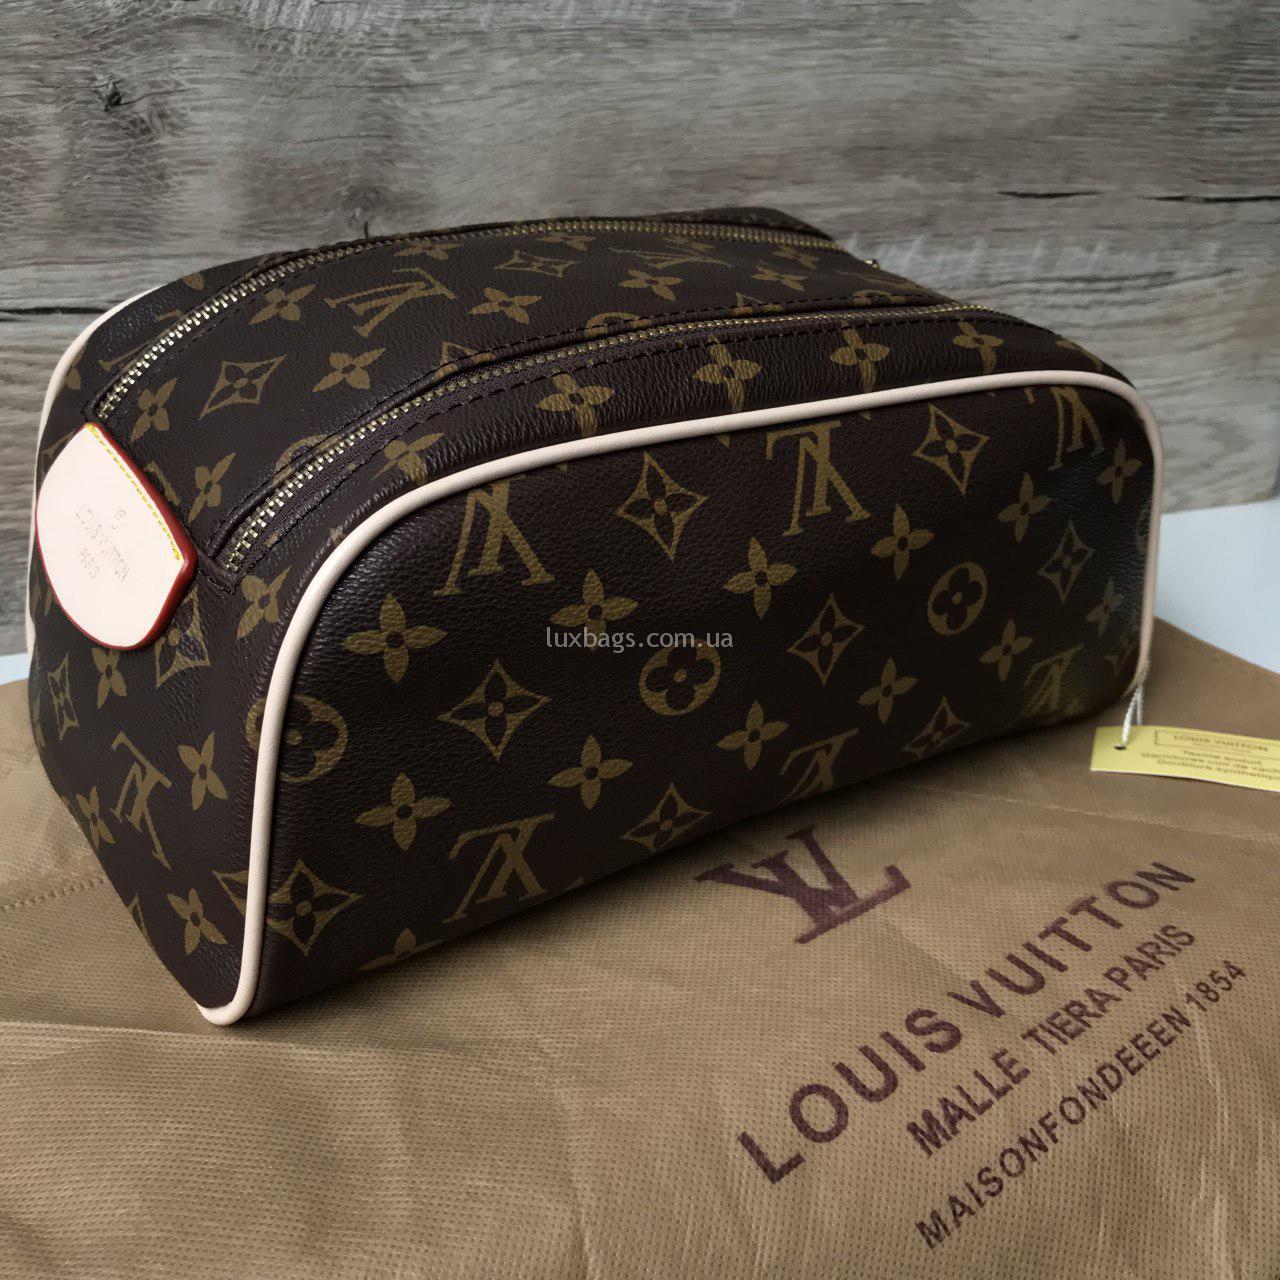 77d4a9cb2dd7 Женская косметичка сумочка Louis Vuitton Купить на lux-bags